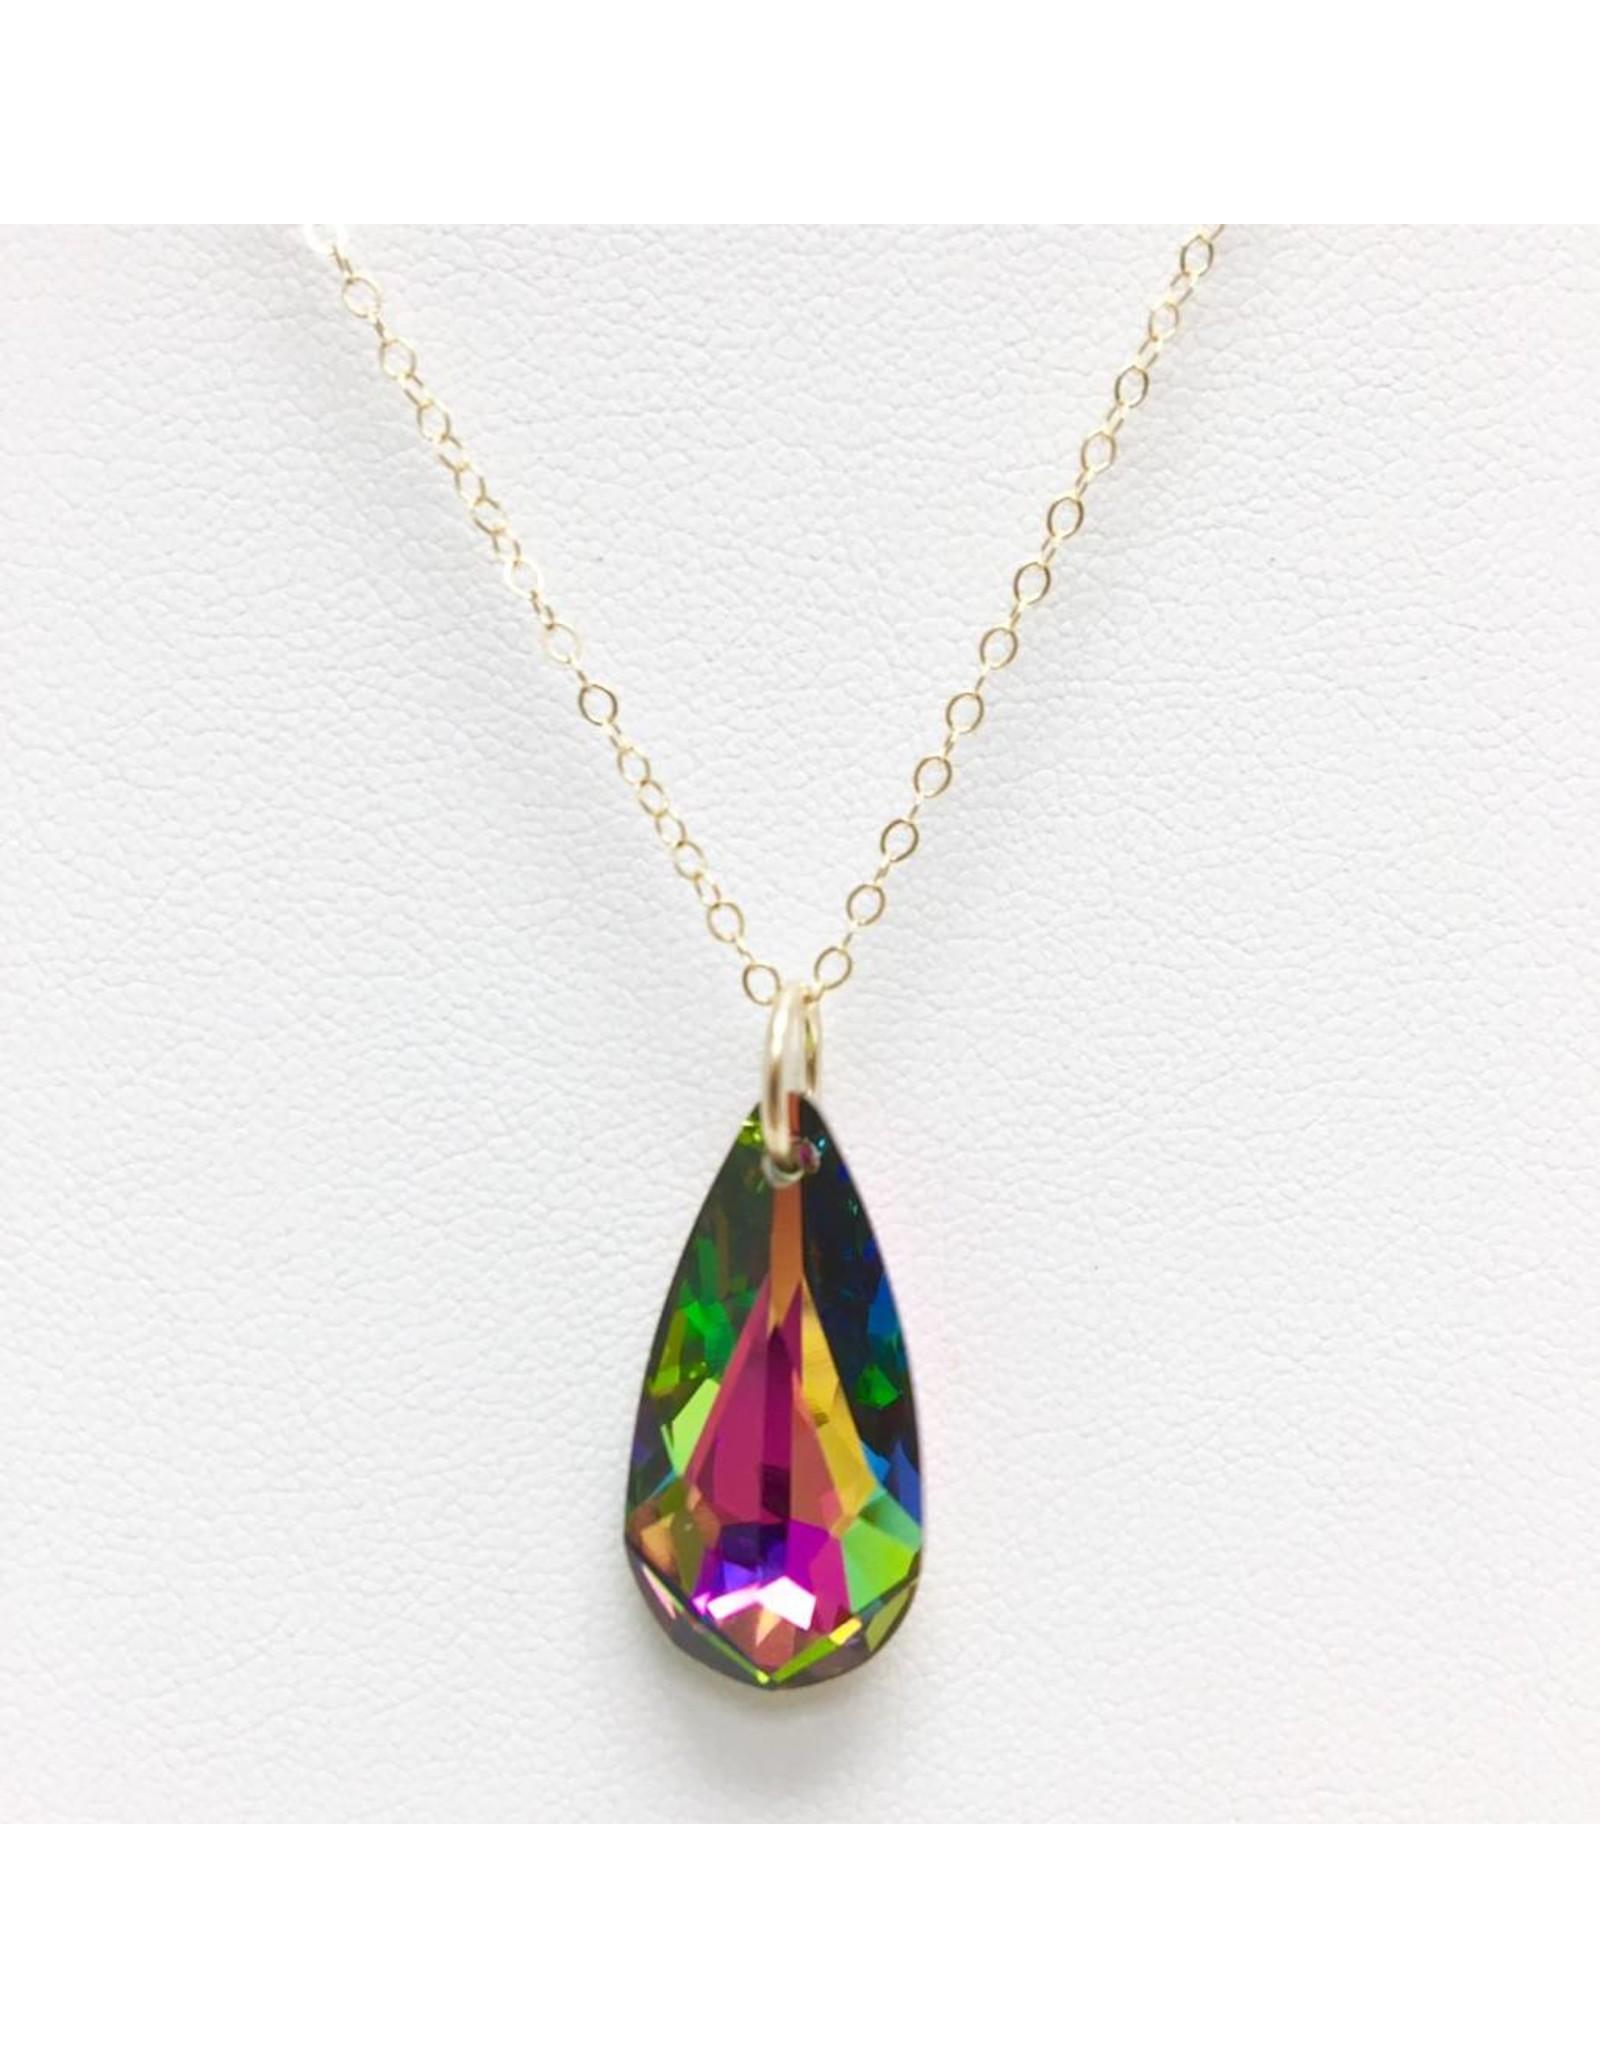 Gold Filled & Crystal Pendant